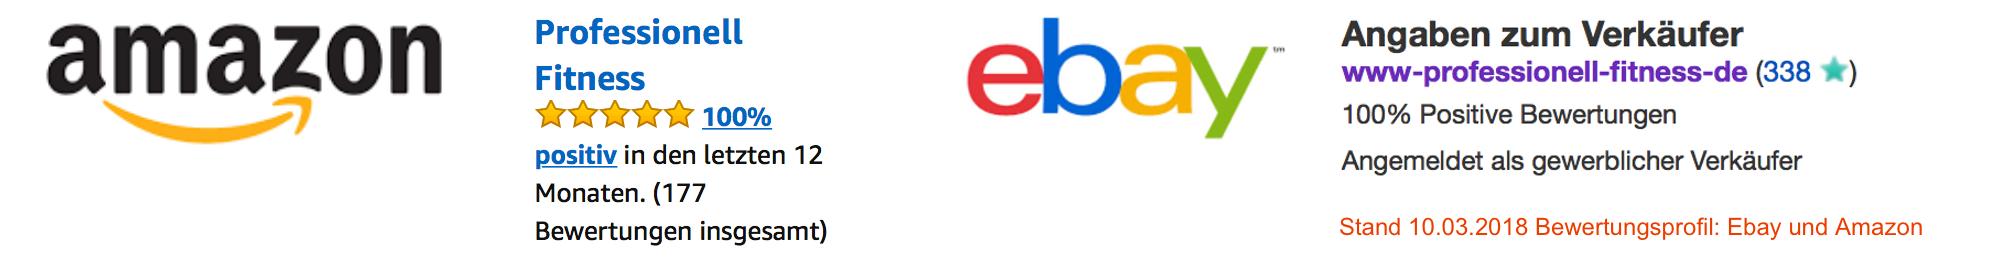 ebay-amazon-Professionell-Fitness